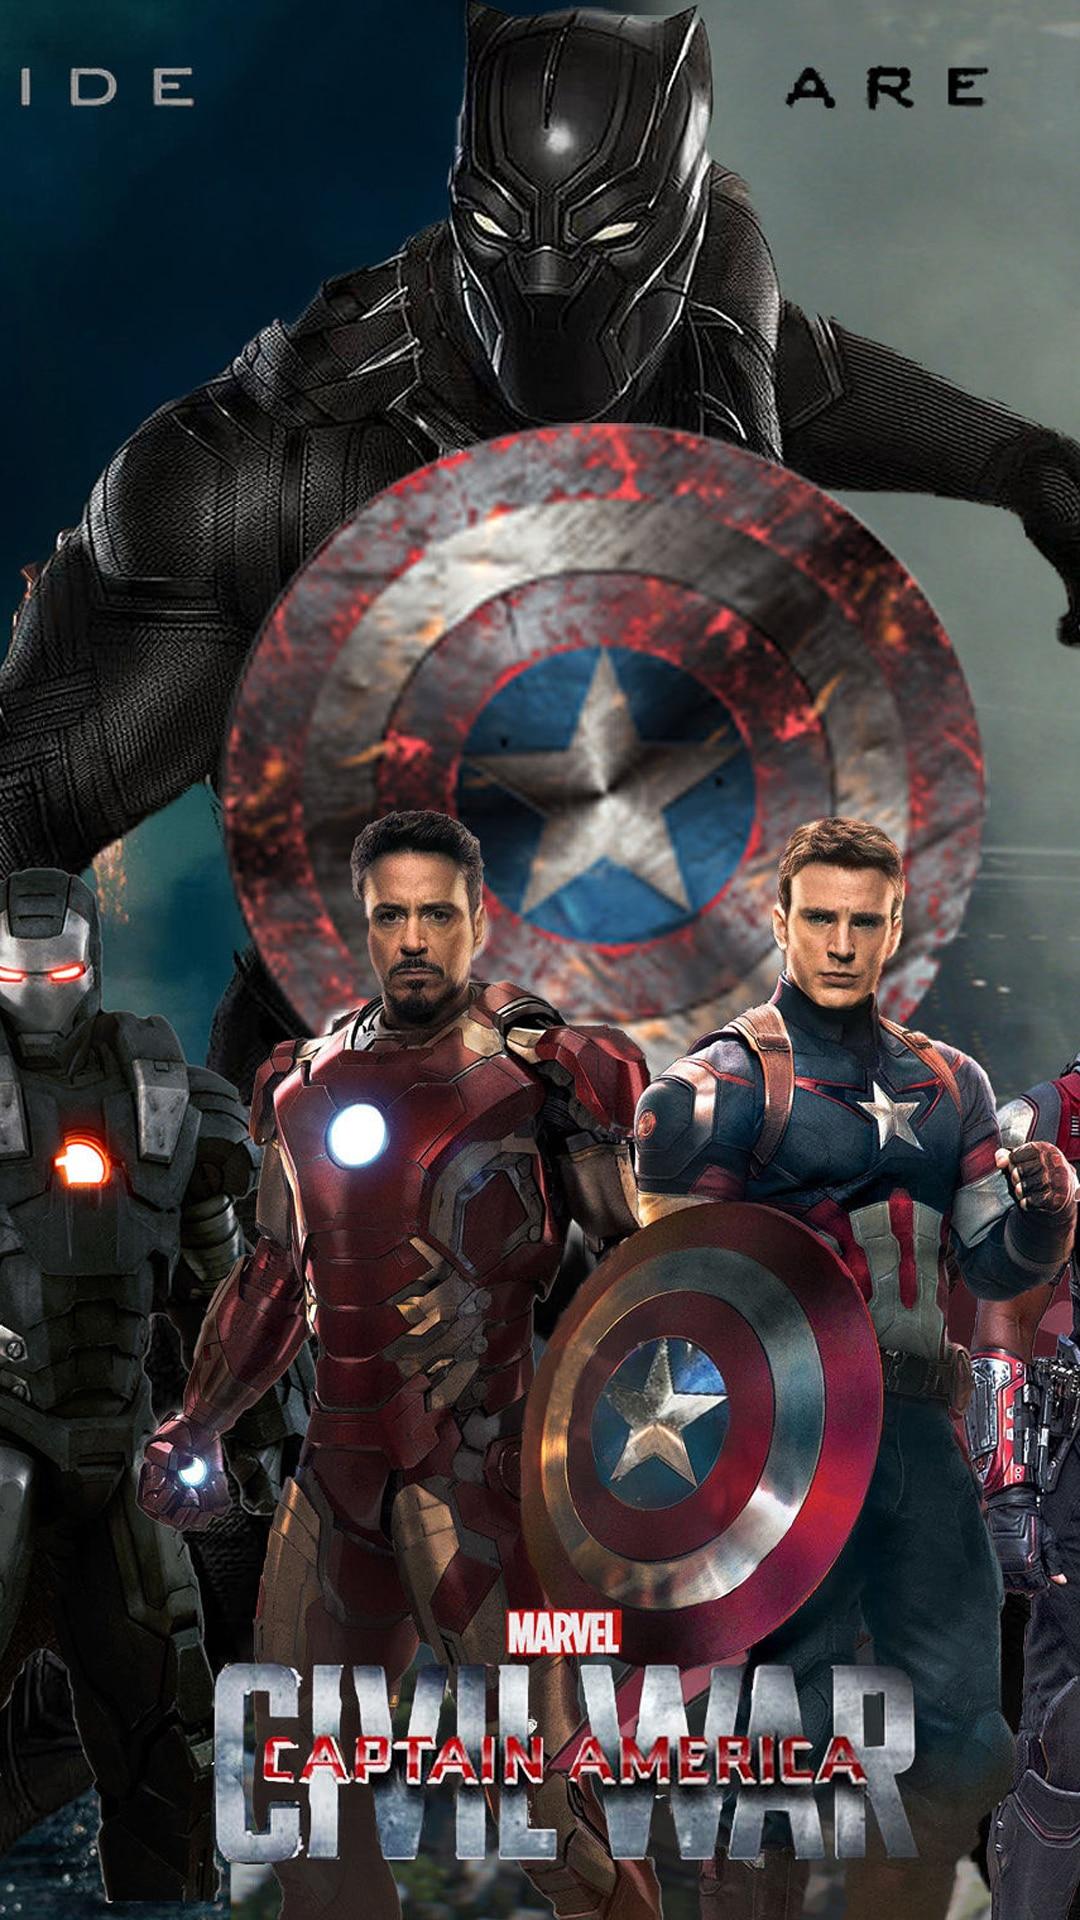 Captain America Civil War Hd Wallpapers For Iphone